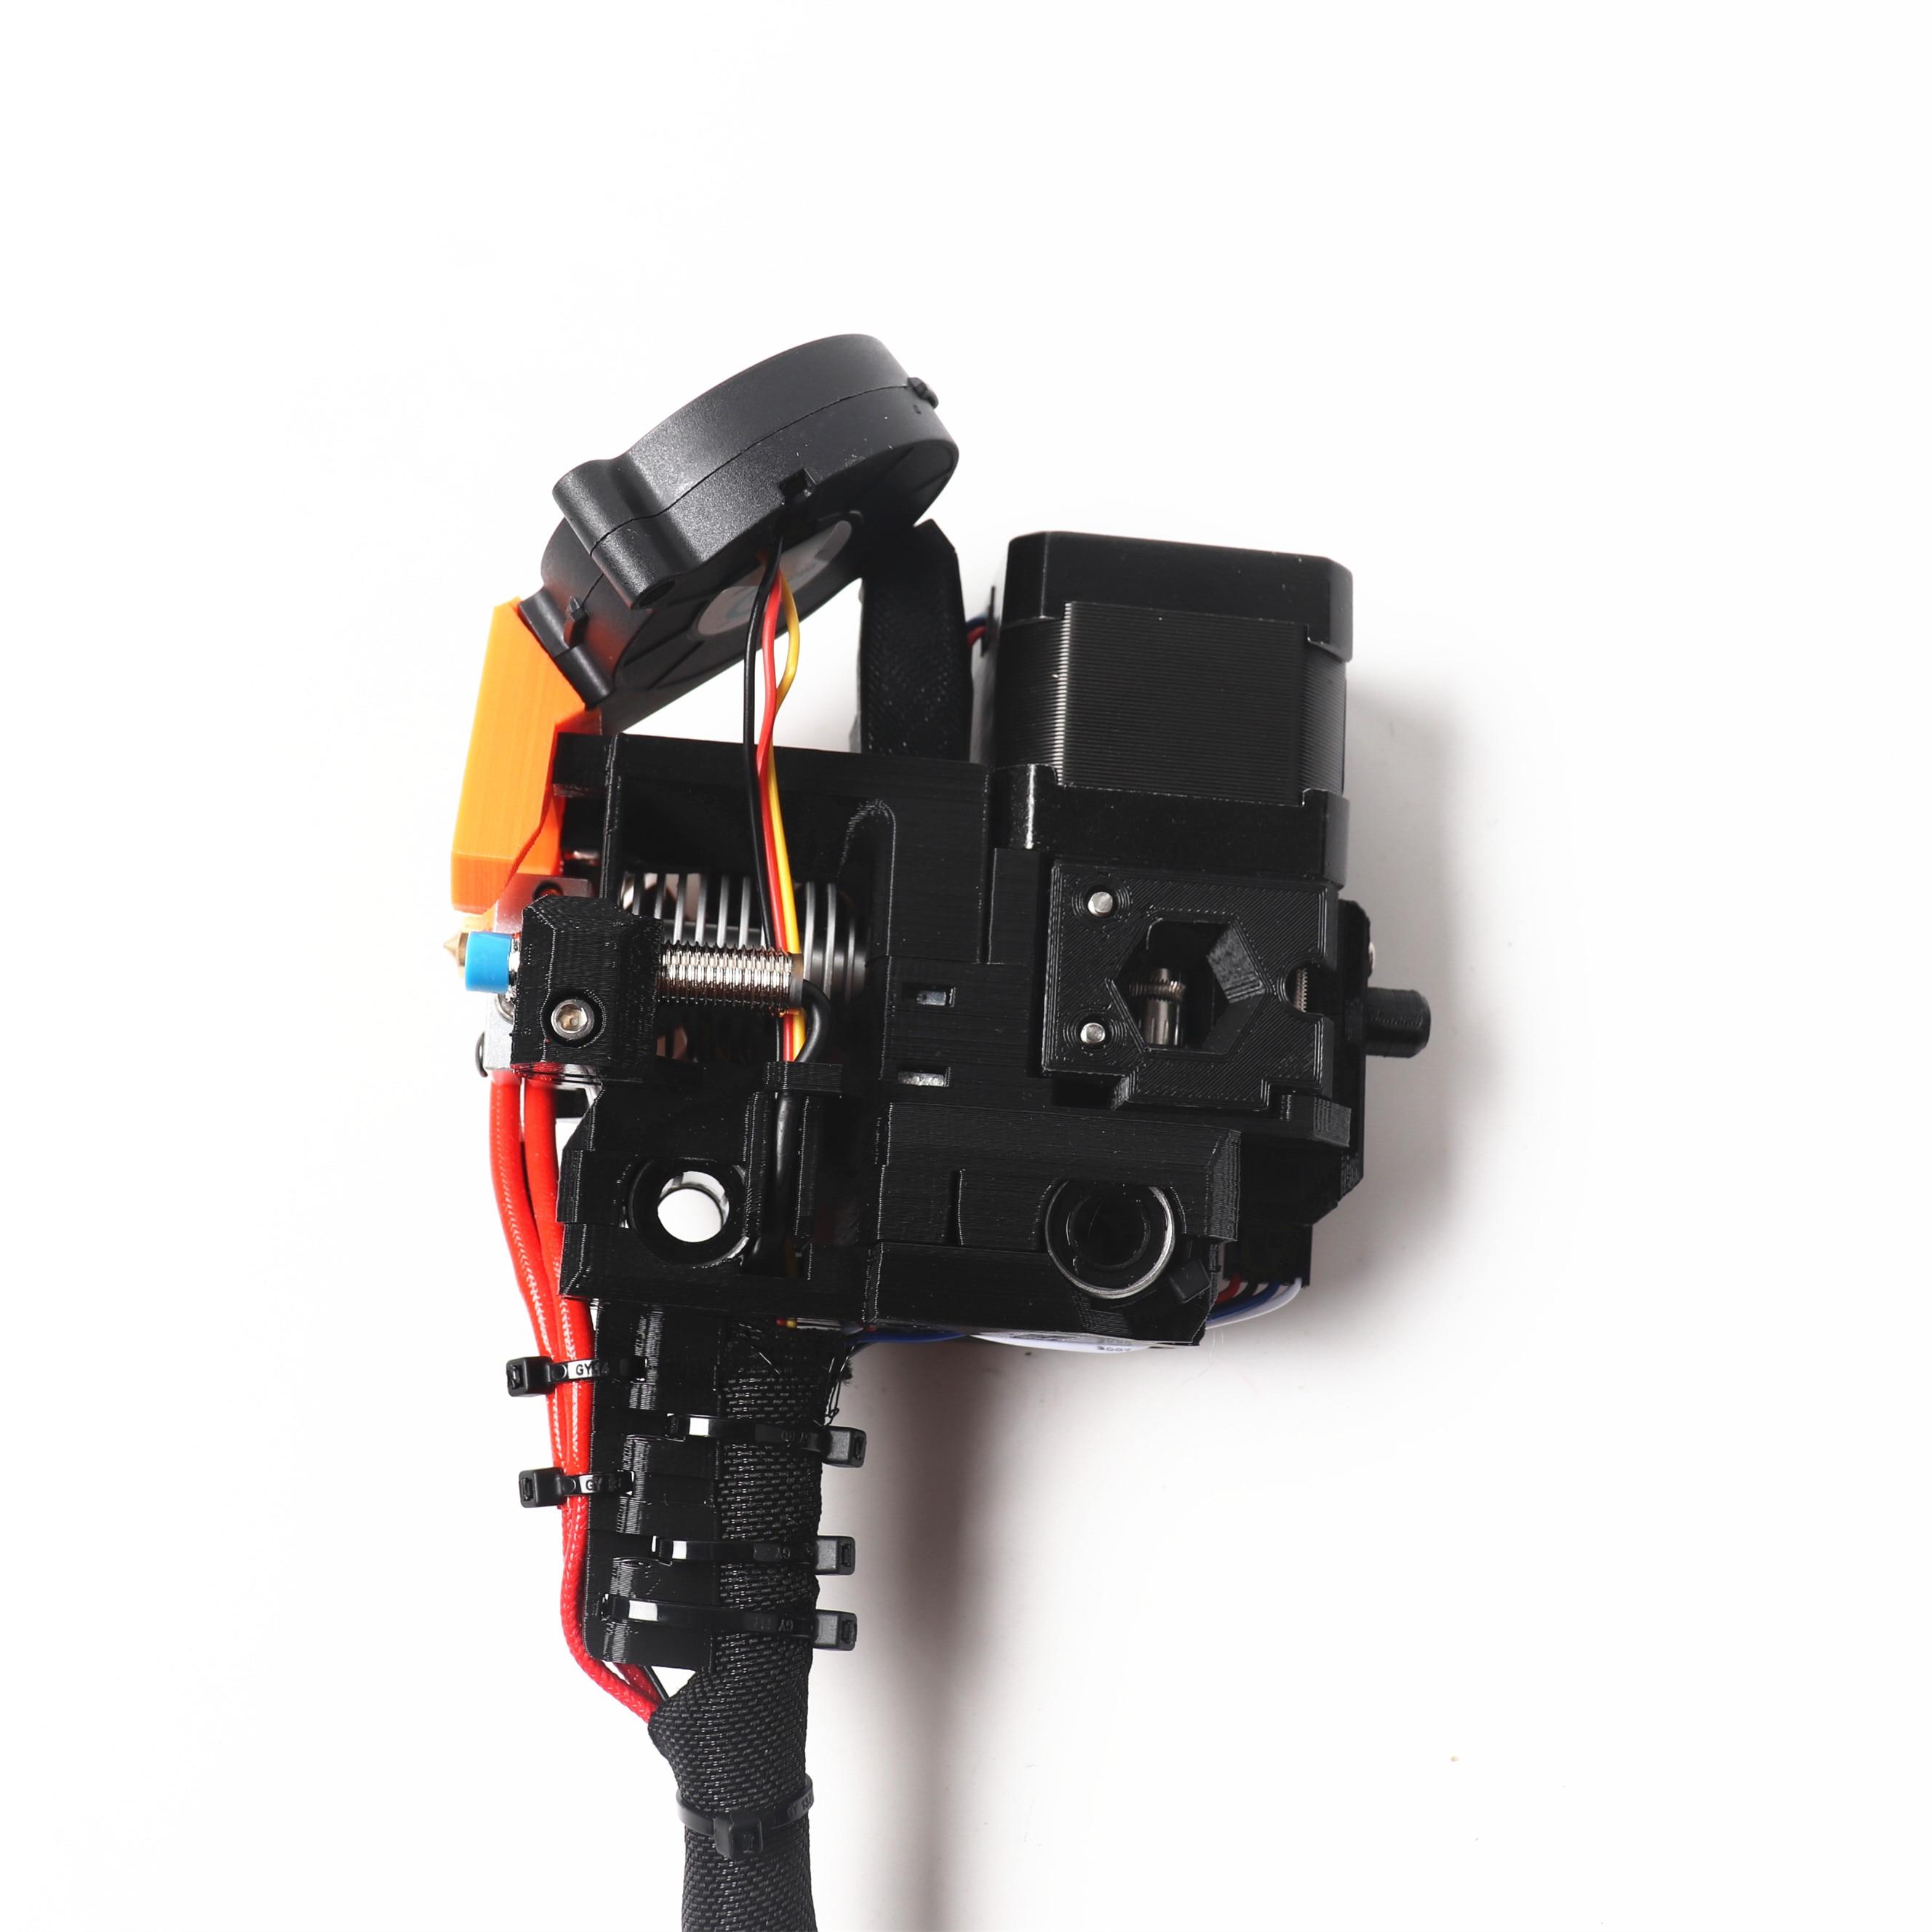 Image 5 - R3 Version !1Set Assembled Prusa i3 MK3  hotend kit 0.4MM nozzle Noctua fan, Pinda v2, filament sensor,textile-in 3D Printer Parts & Accessories from Computer & Office